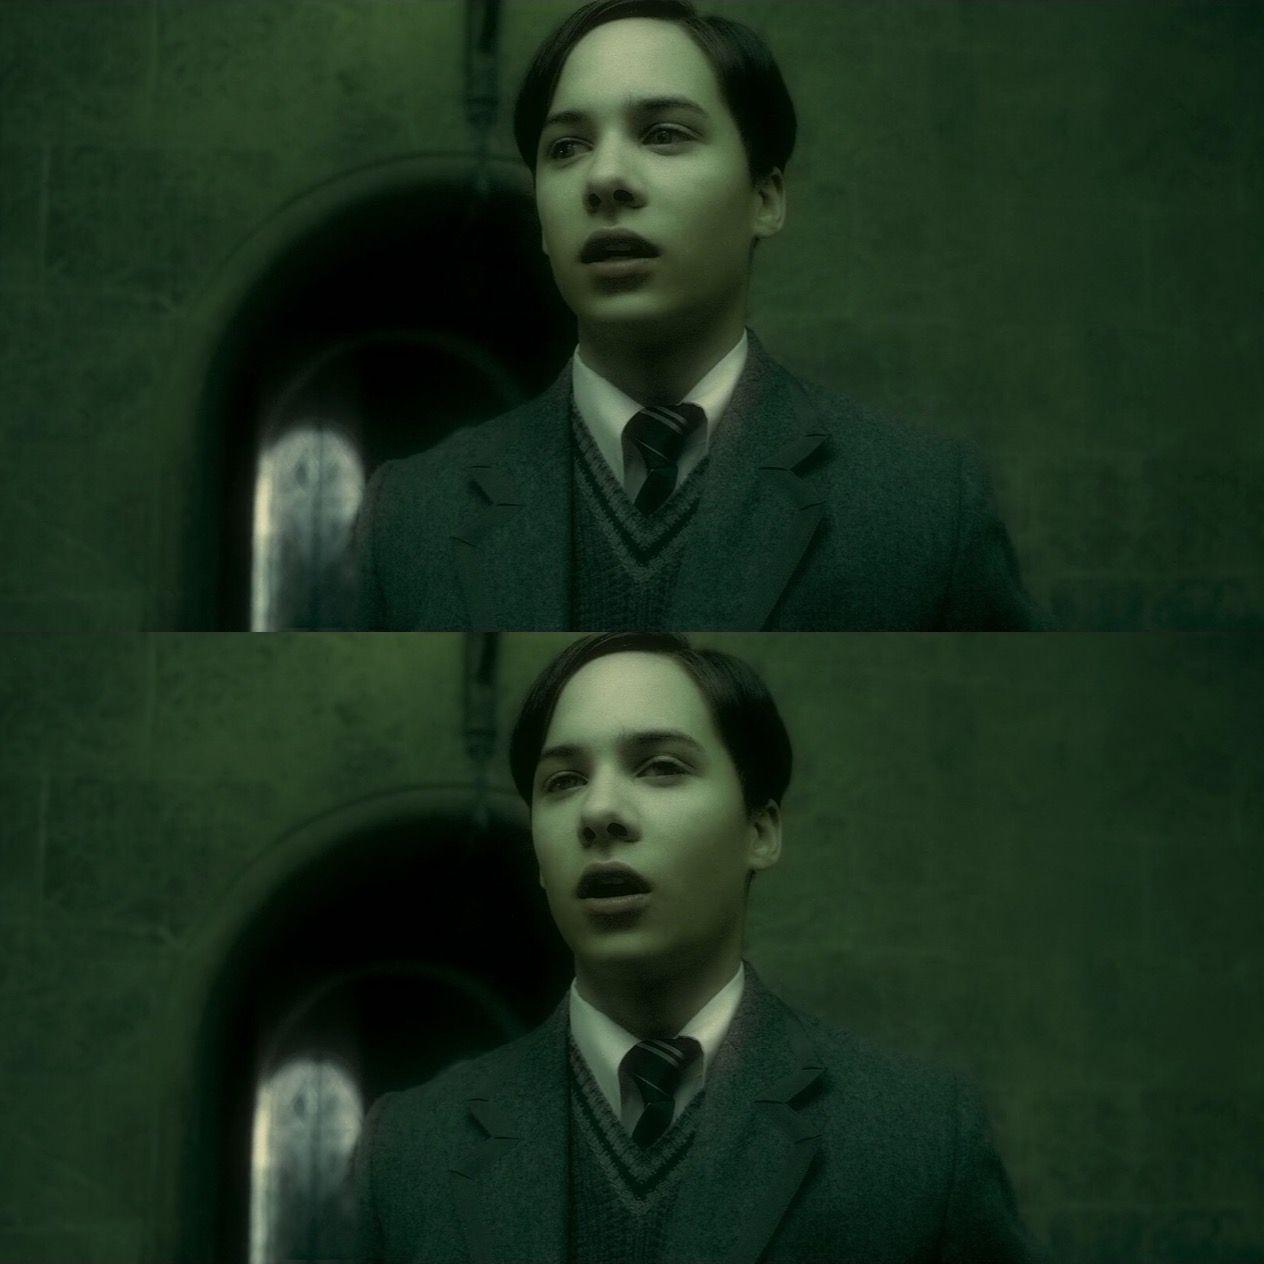 Frank Dillane Tom Riddle Harry Potter 40 Yil Karanlik